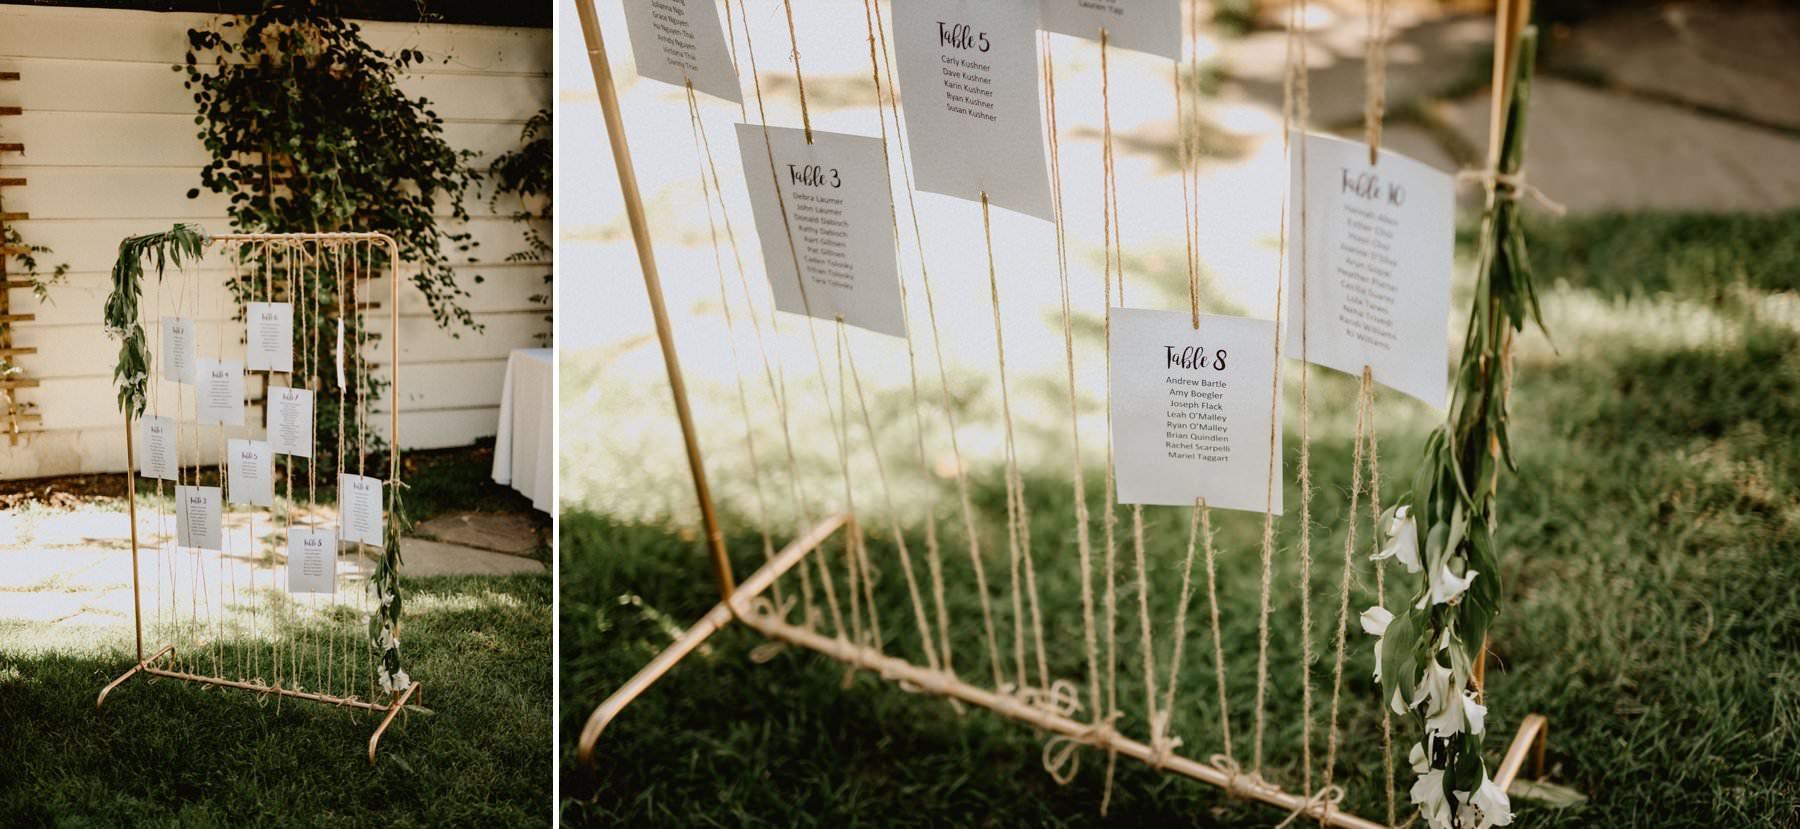 Appleford-estate-wedding-100.jpg